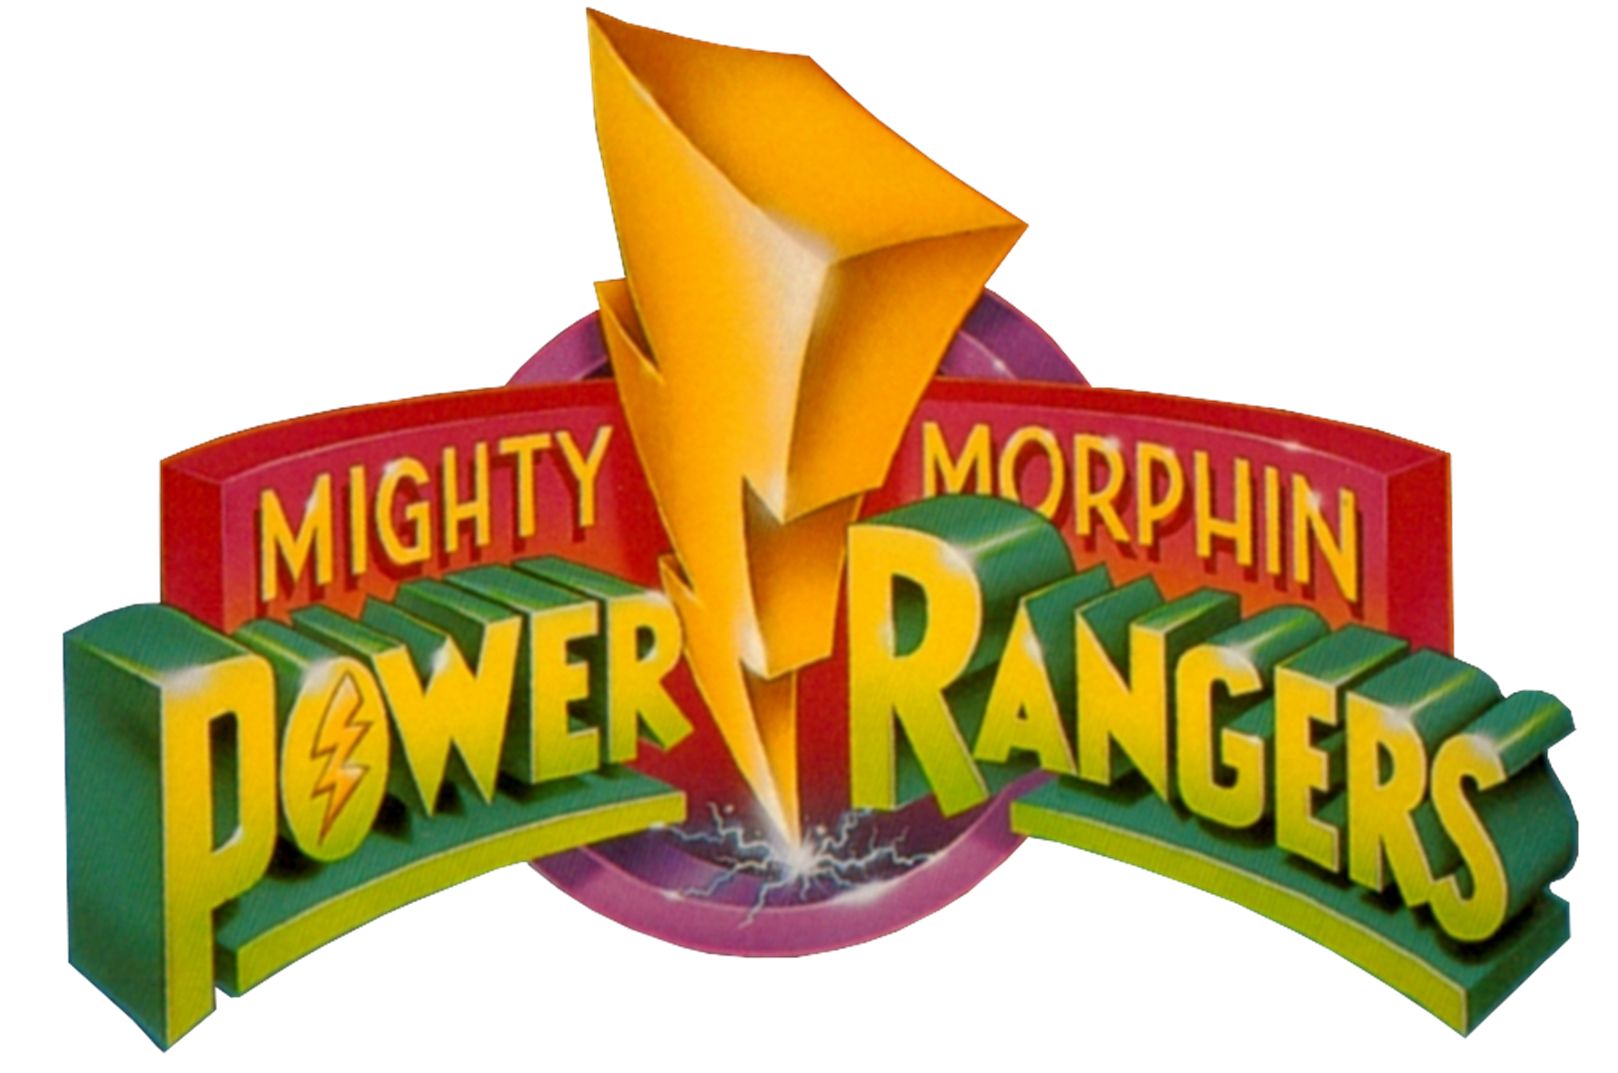 Power rangers logo png clipart jpg freeuse library Mighty Morphin Power Rangers (Season 1)   RangerWiki   Fandom ... jpg freeuse library